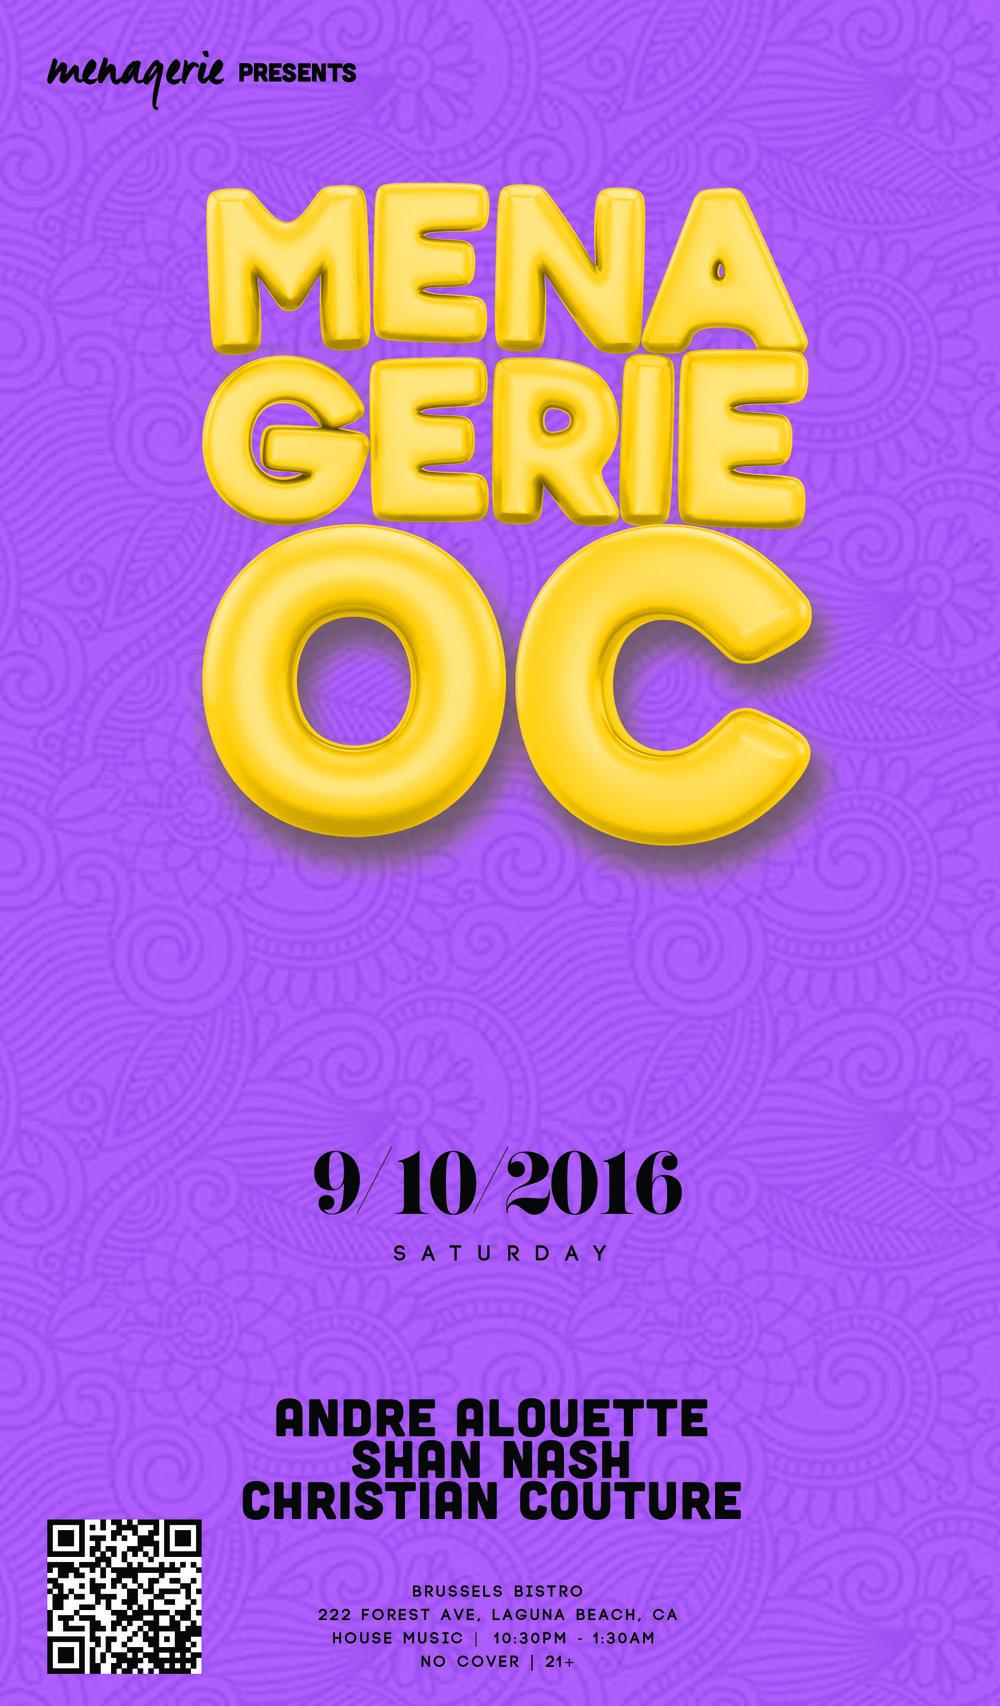 9-10-2016 Brussels print size.jpg